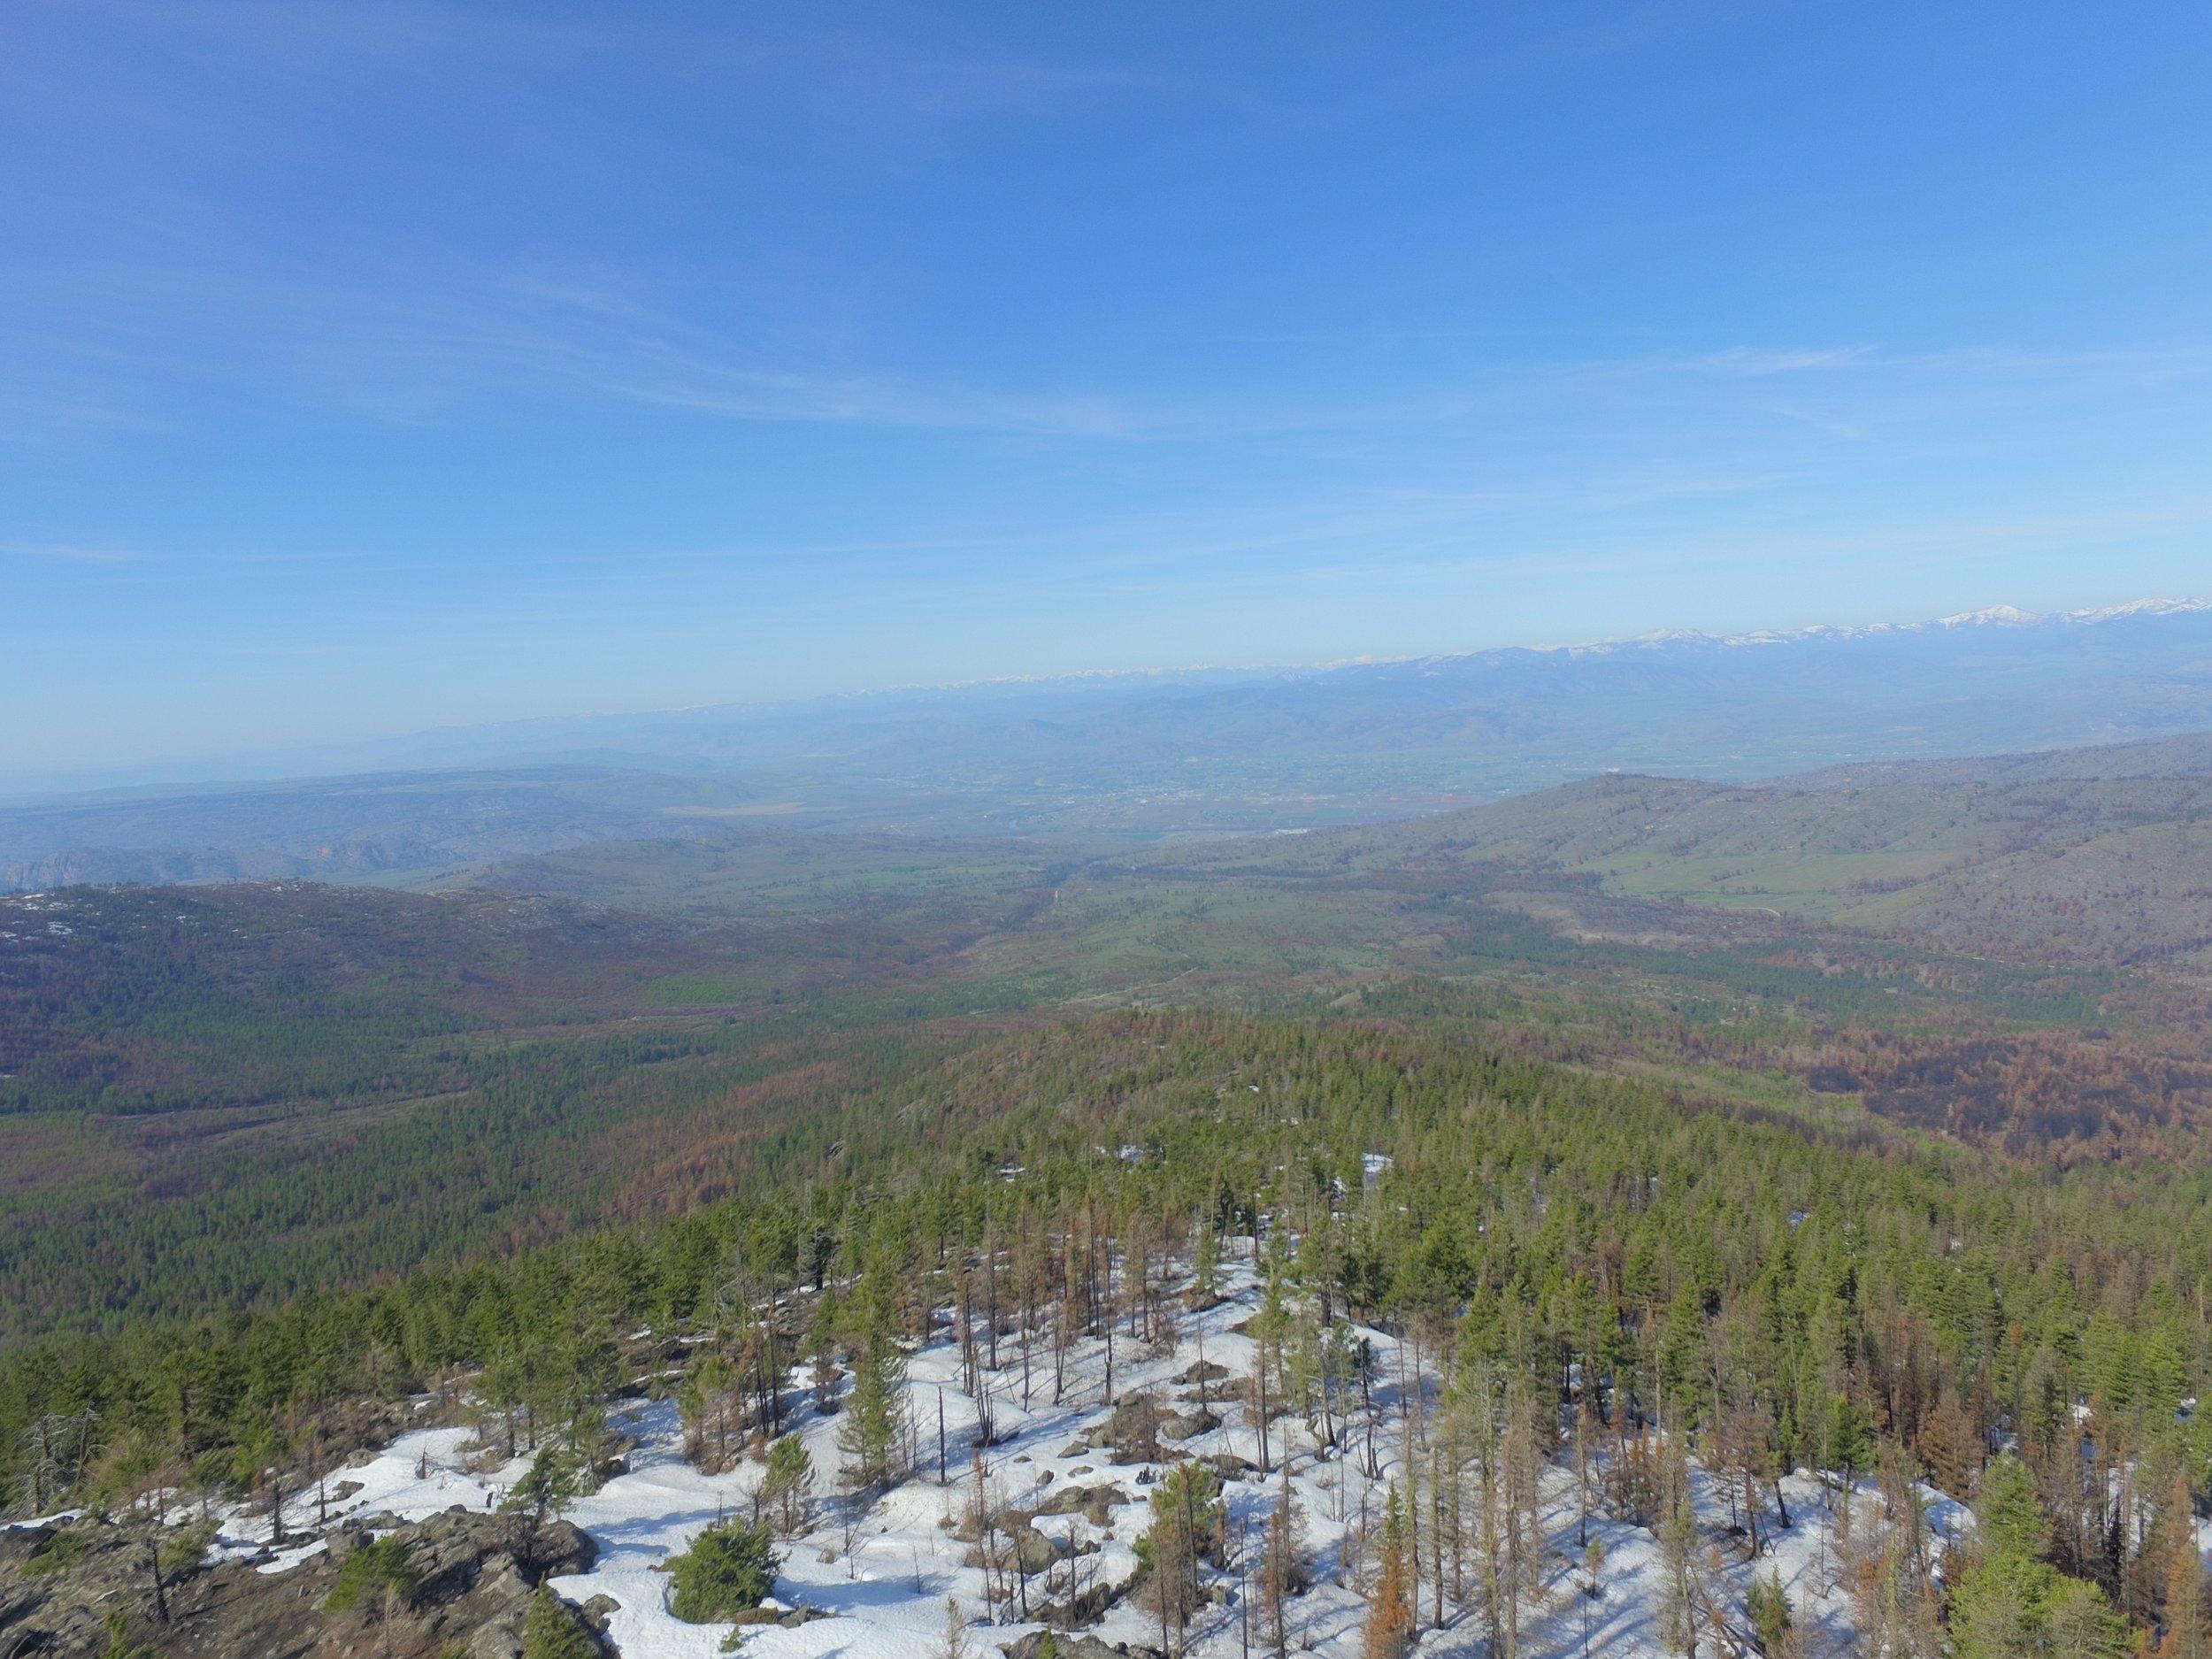 Omak Mt looking to Omak